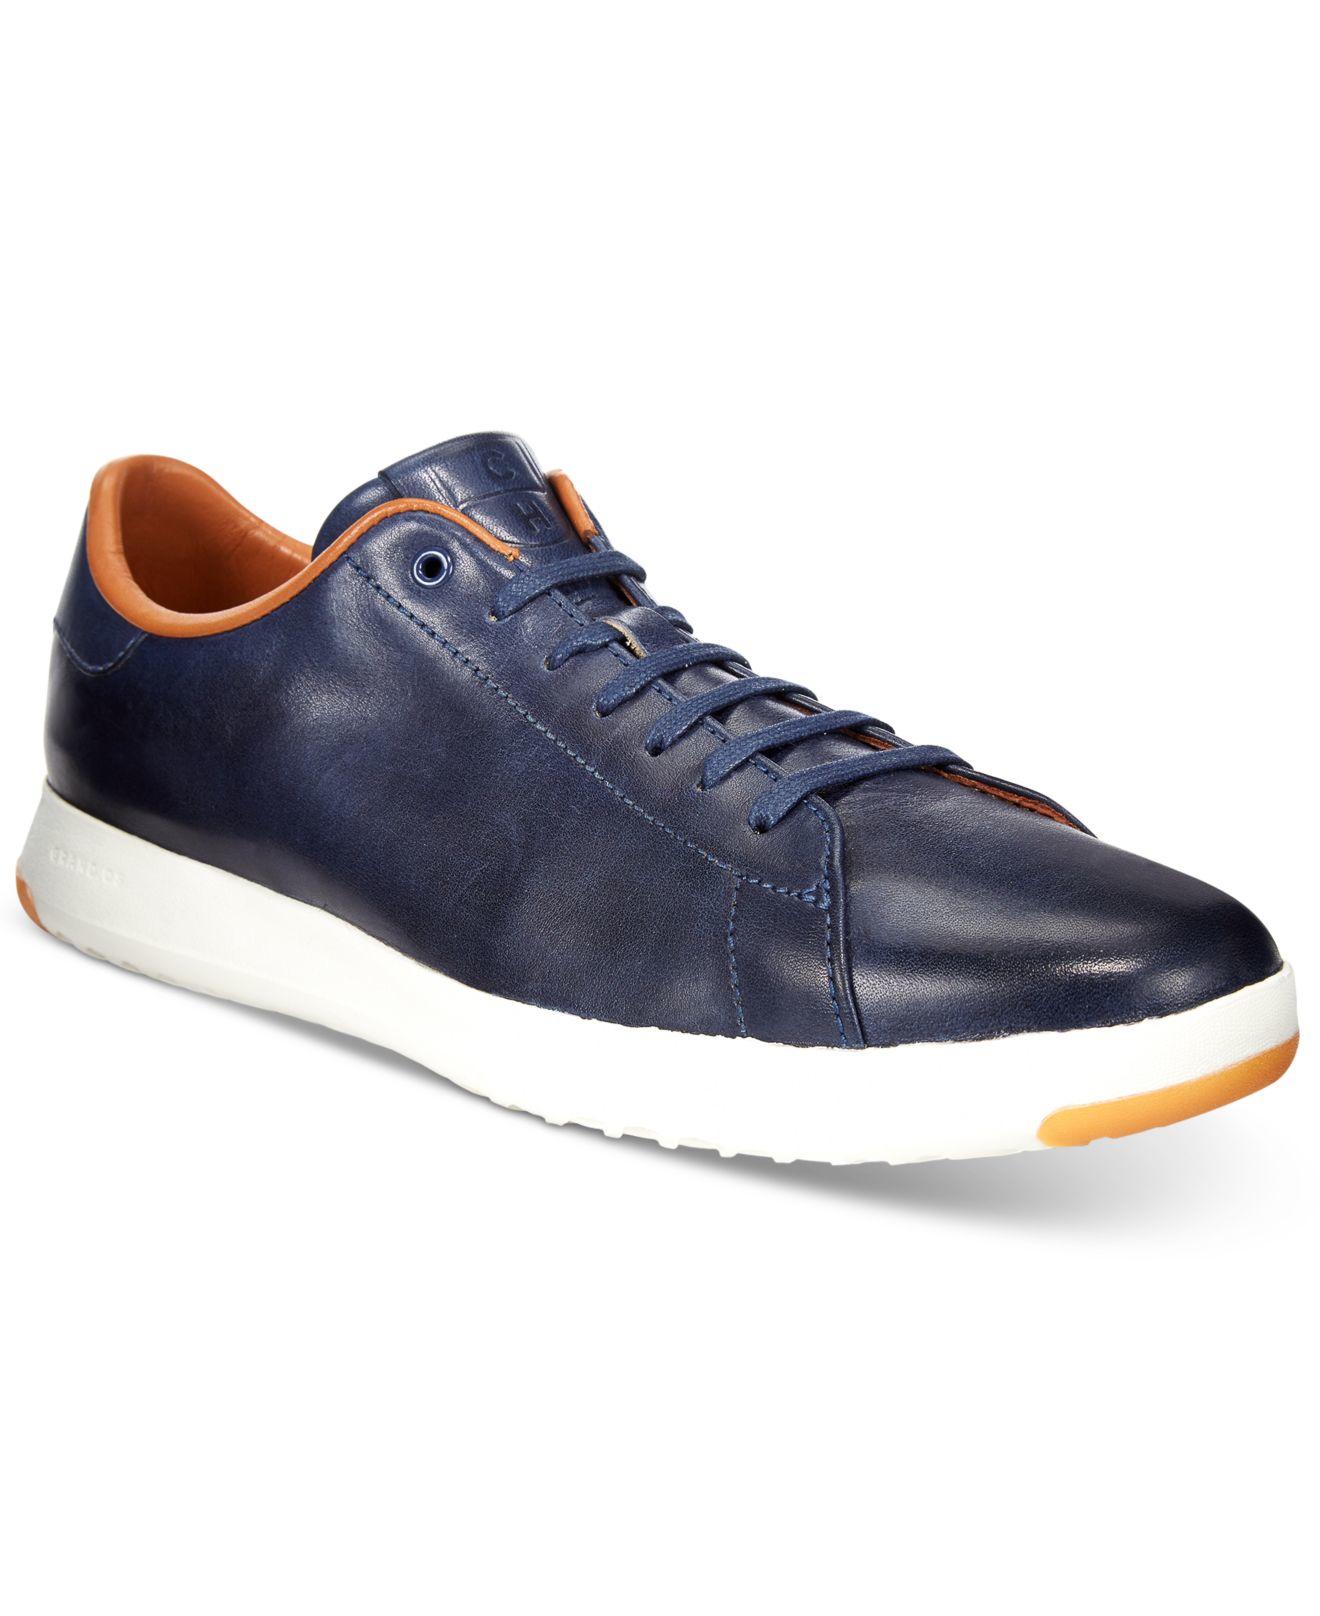 cole haan s grandpro tennis sneakers in blue for